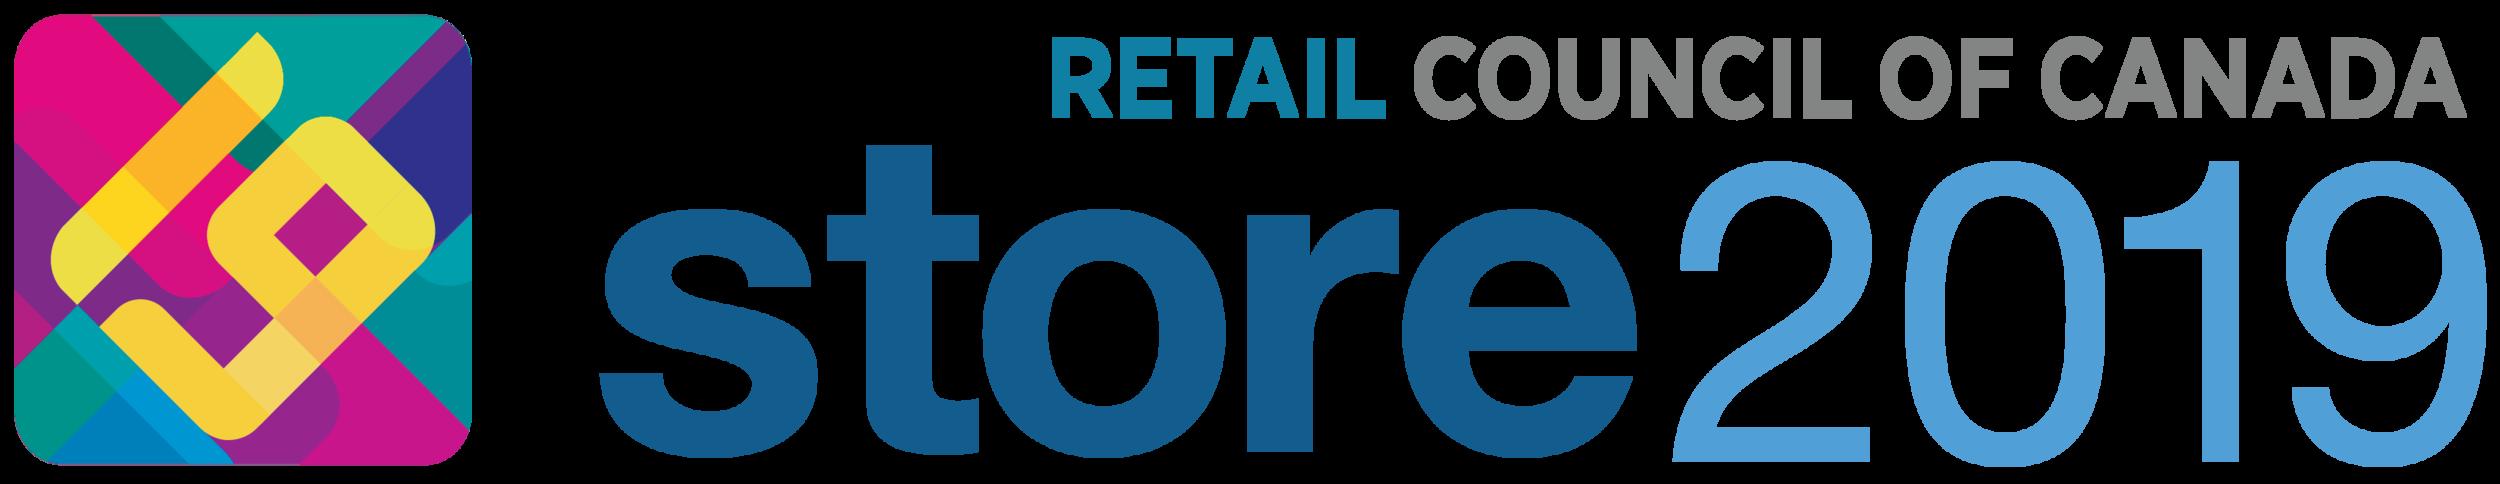 Store 19 full logo HD-01.png